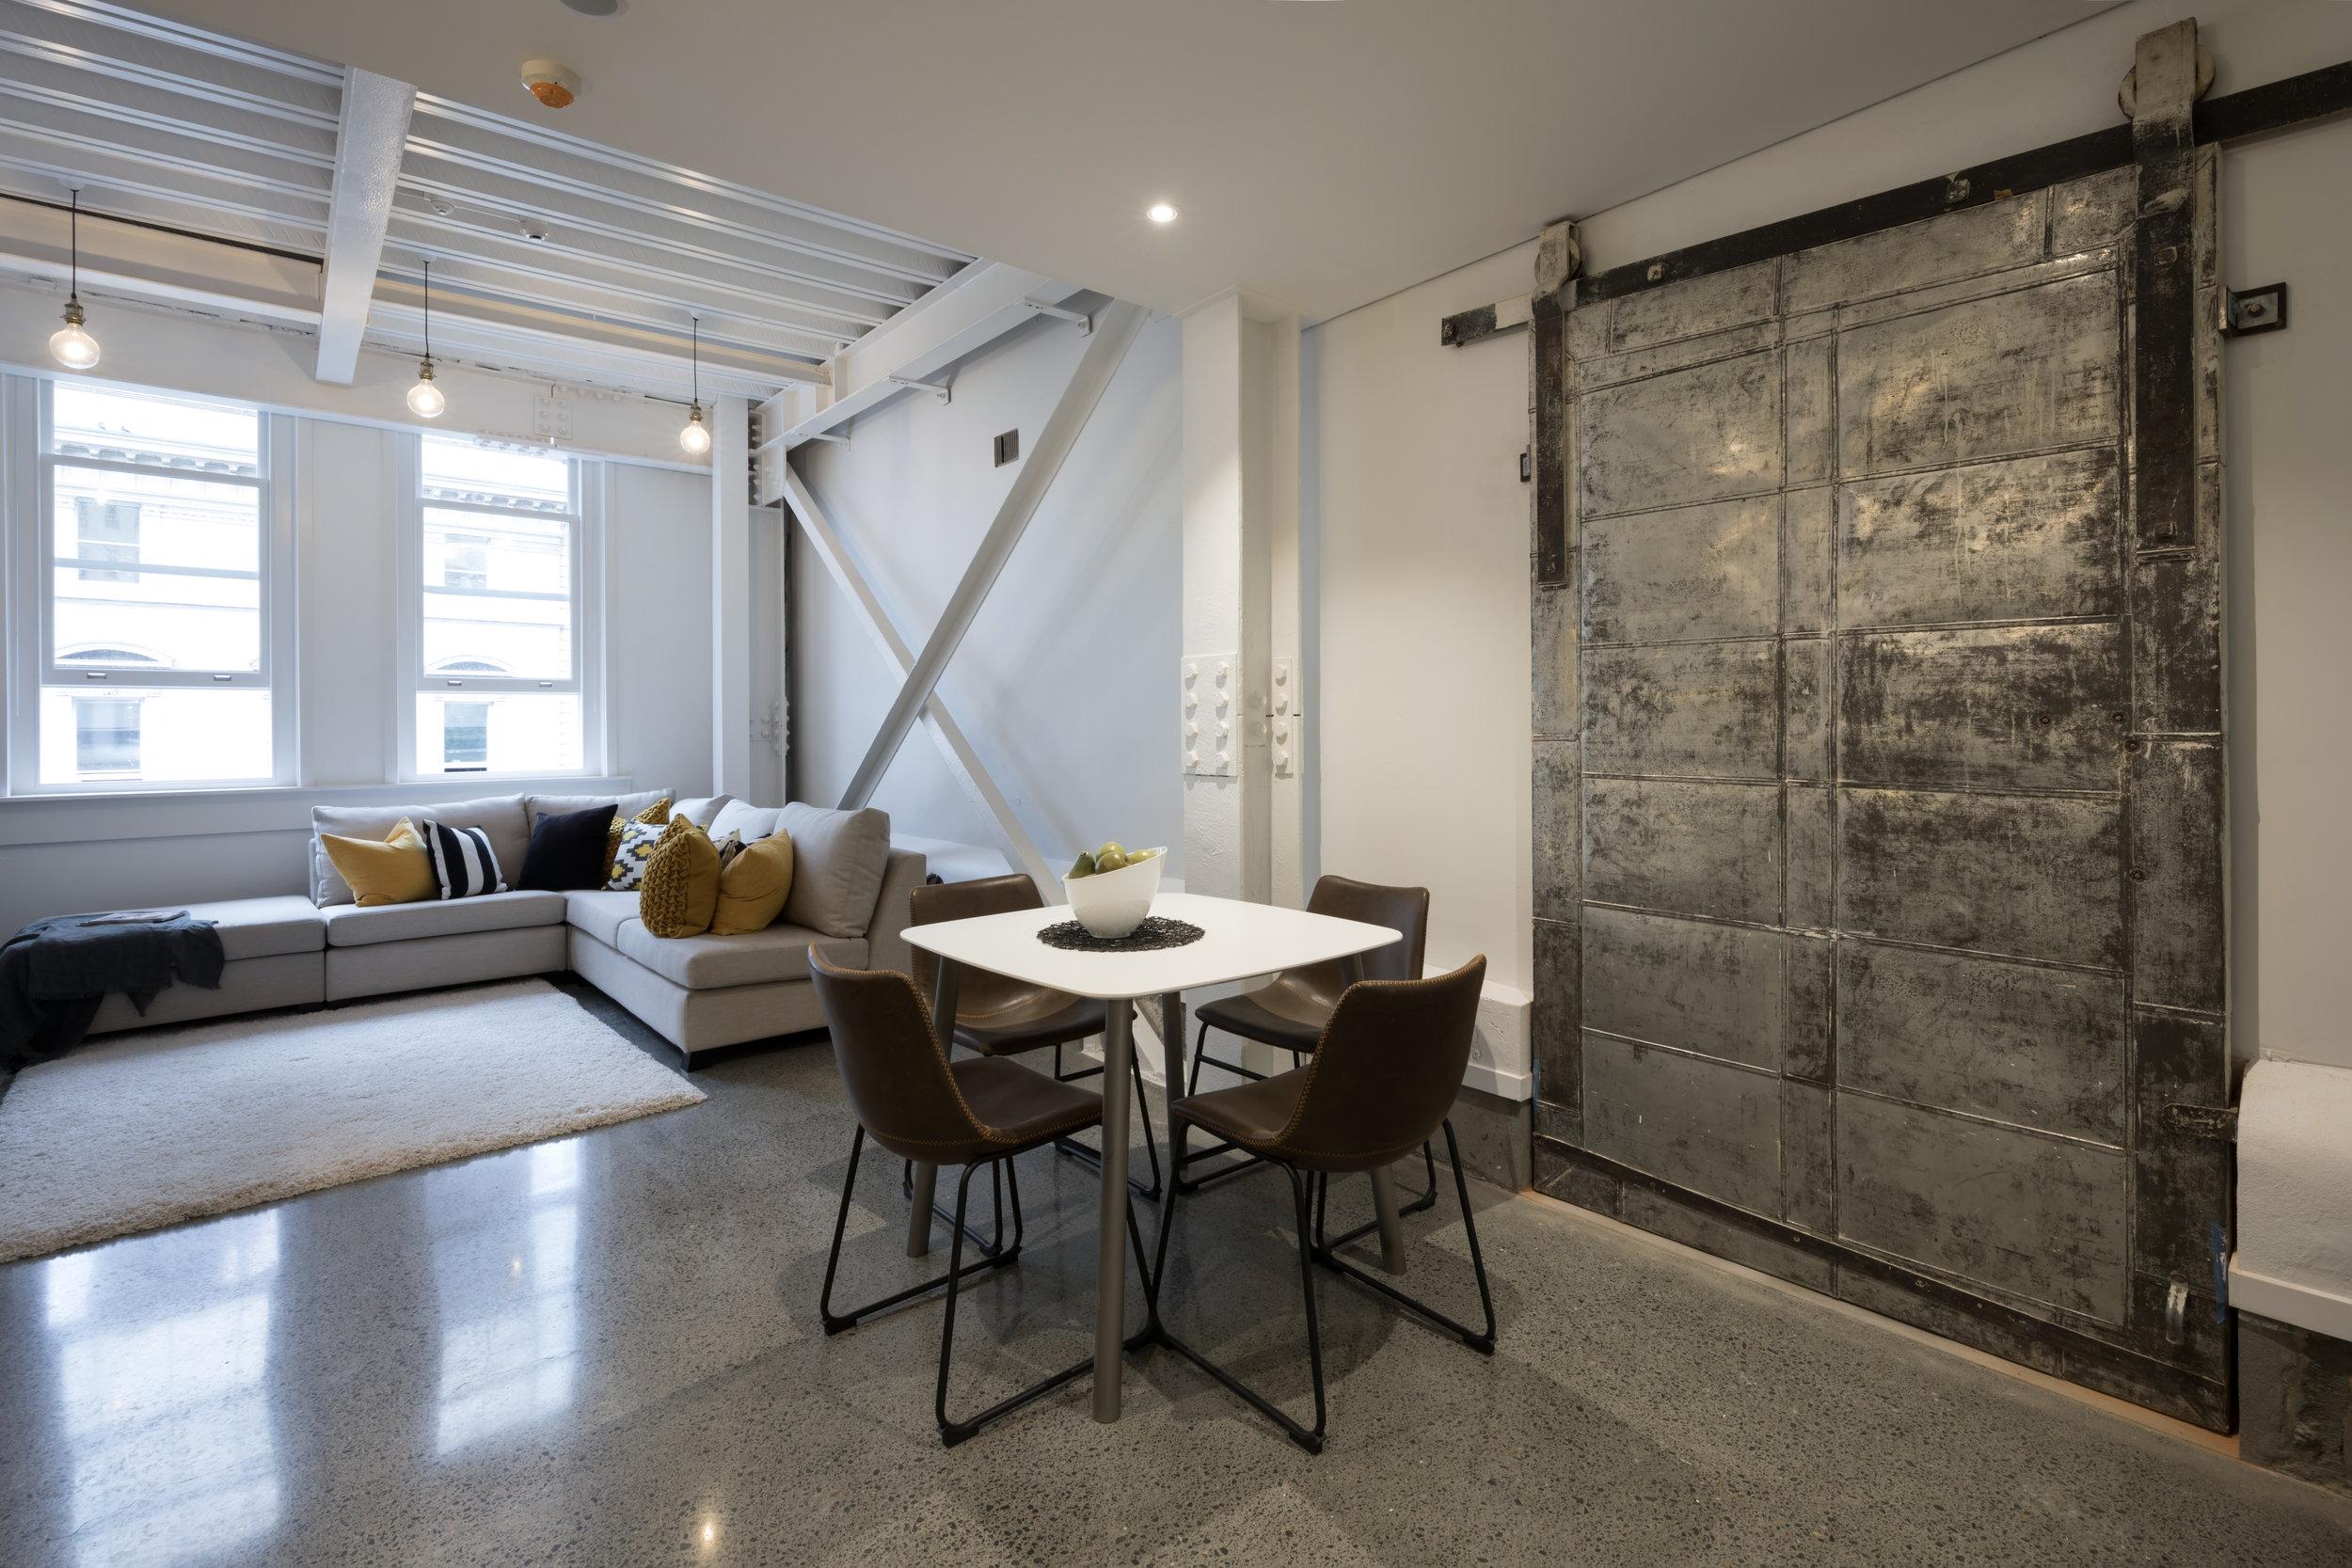 94-96 Queen Street, Auckland NZ. Small Space Interior Design specialists, Pocketspace Interiors